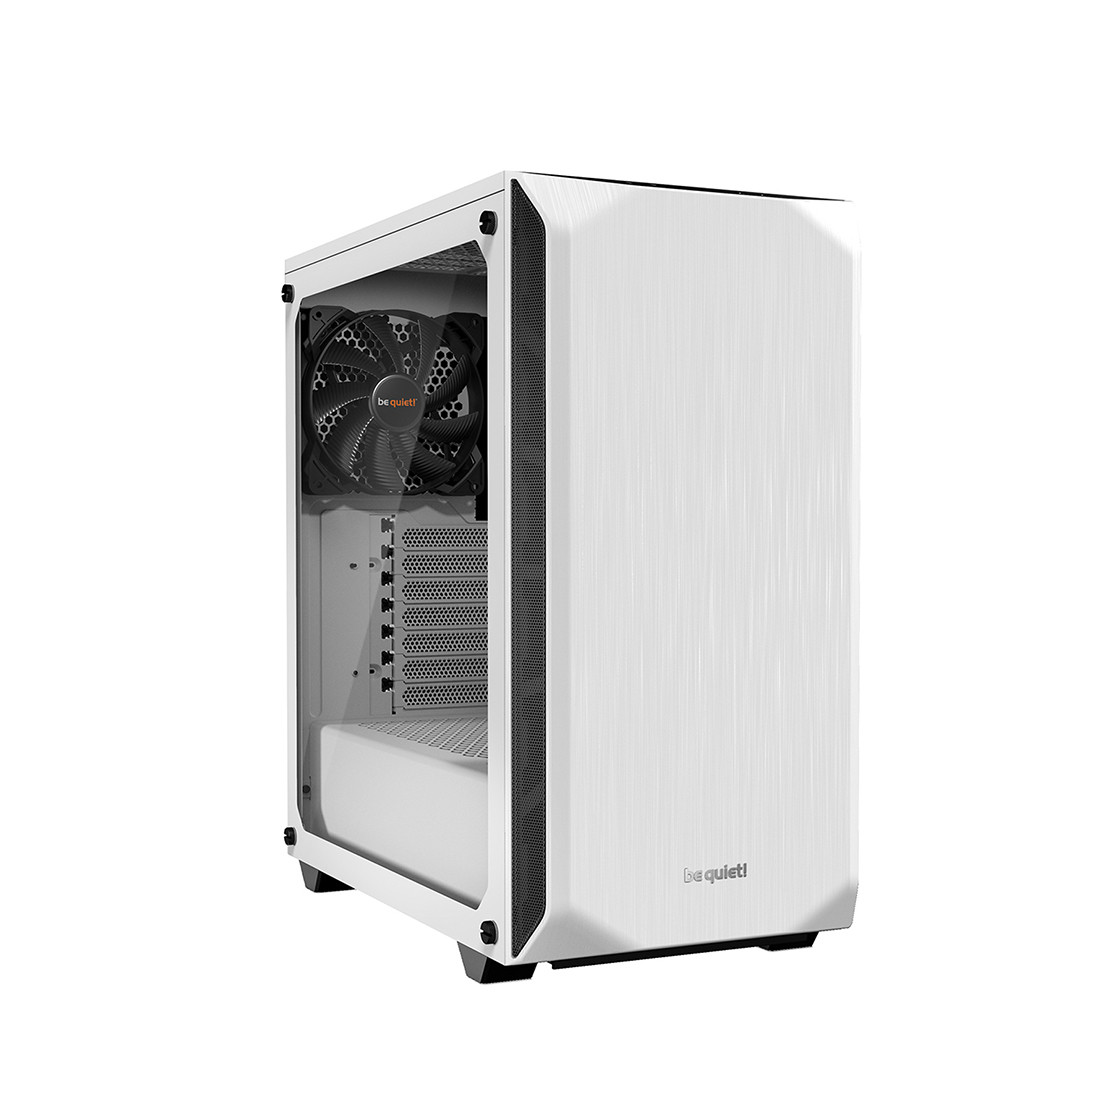 Компьютерный корпус, Bequiet!, Pure Base 500 Window, BGW35, Без Б/П, ATX PS/2, ATX/ M-ATX/ Mini-ITX, 2xUSB